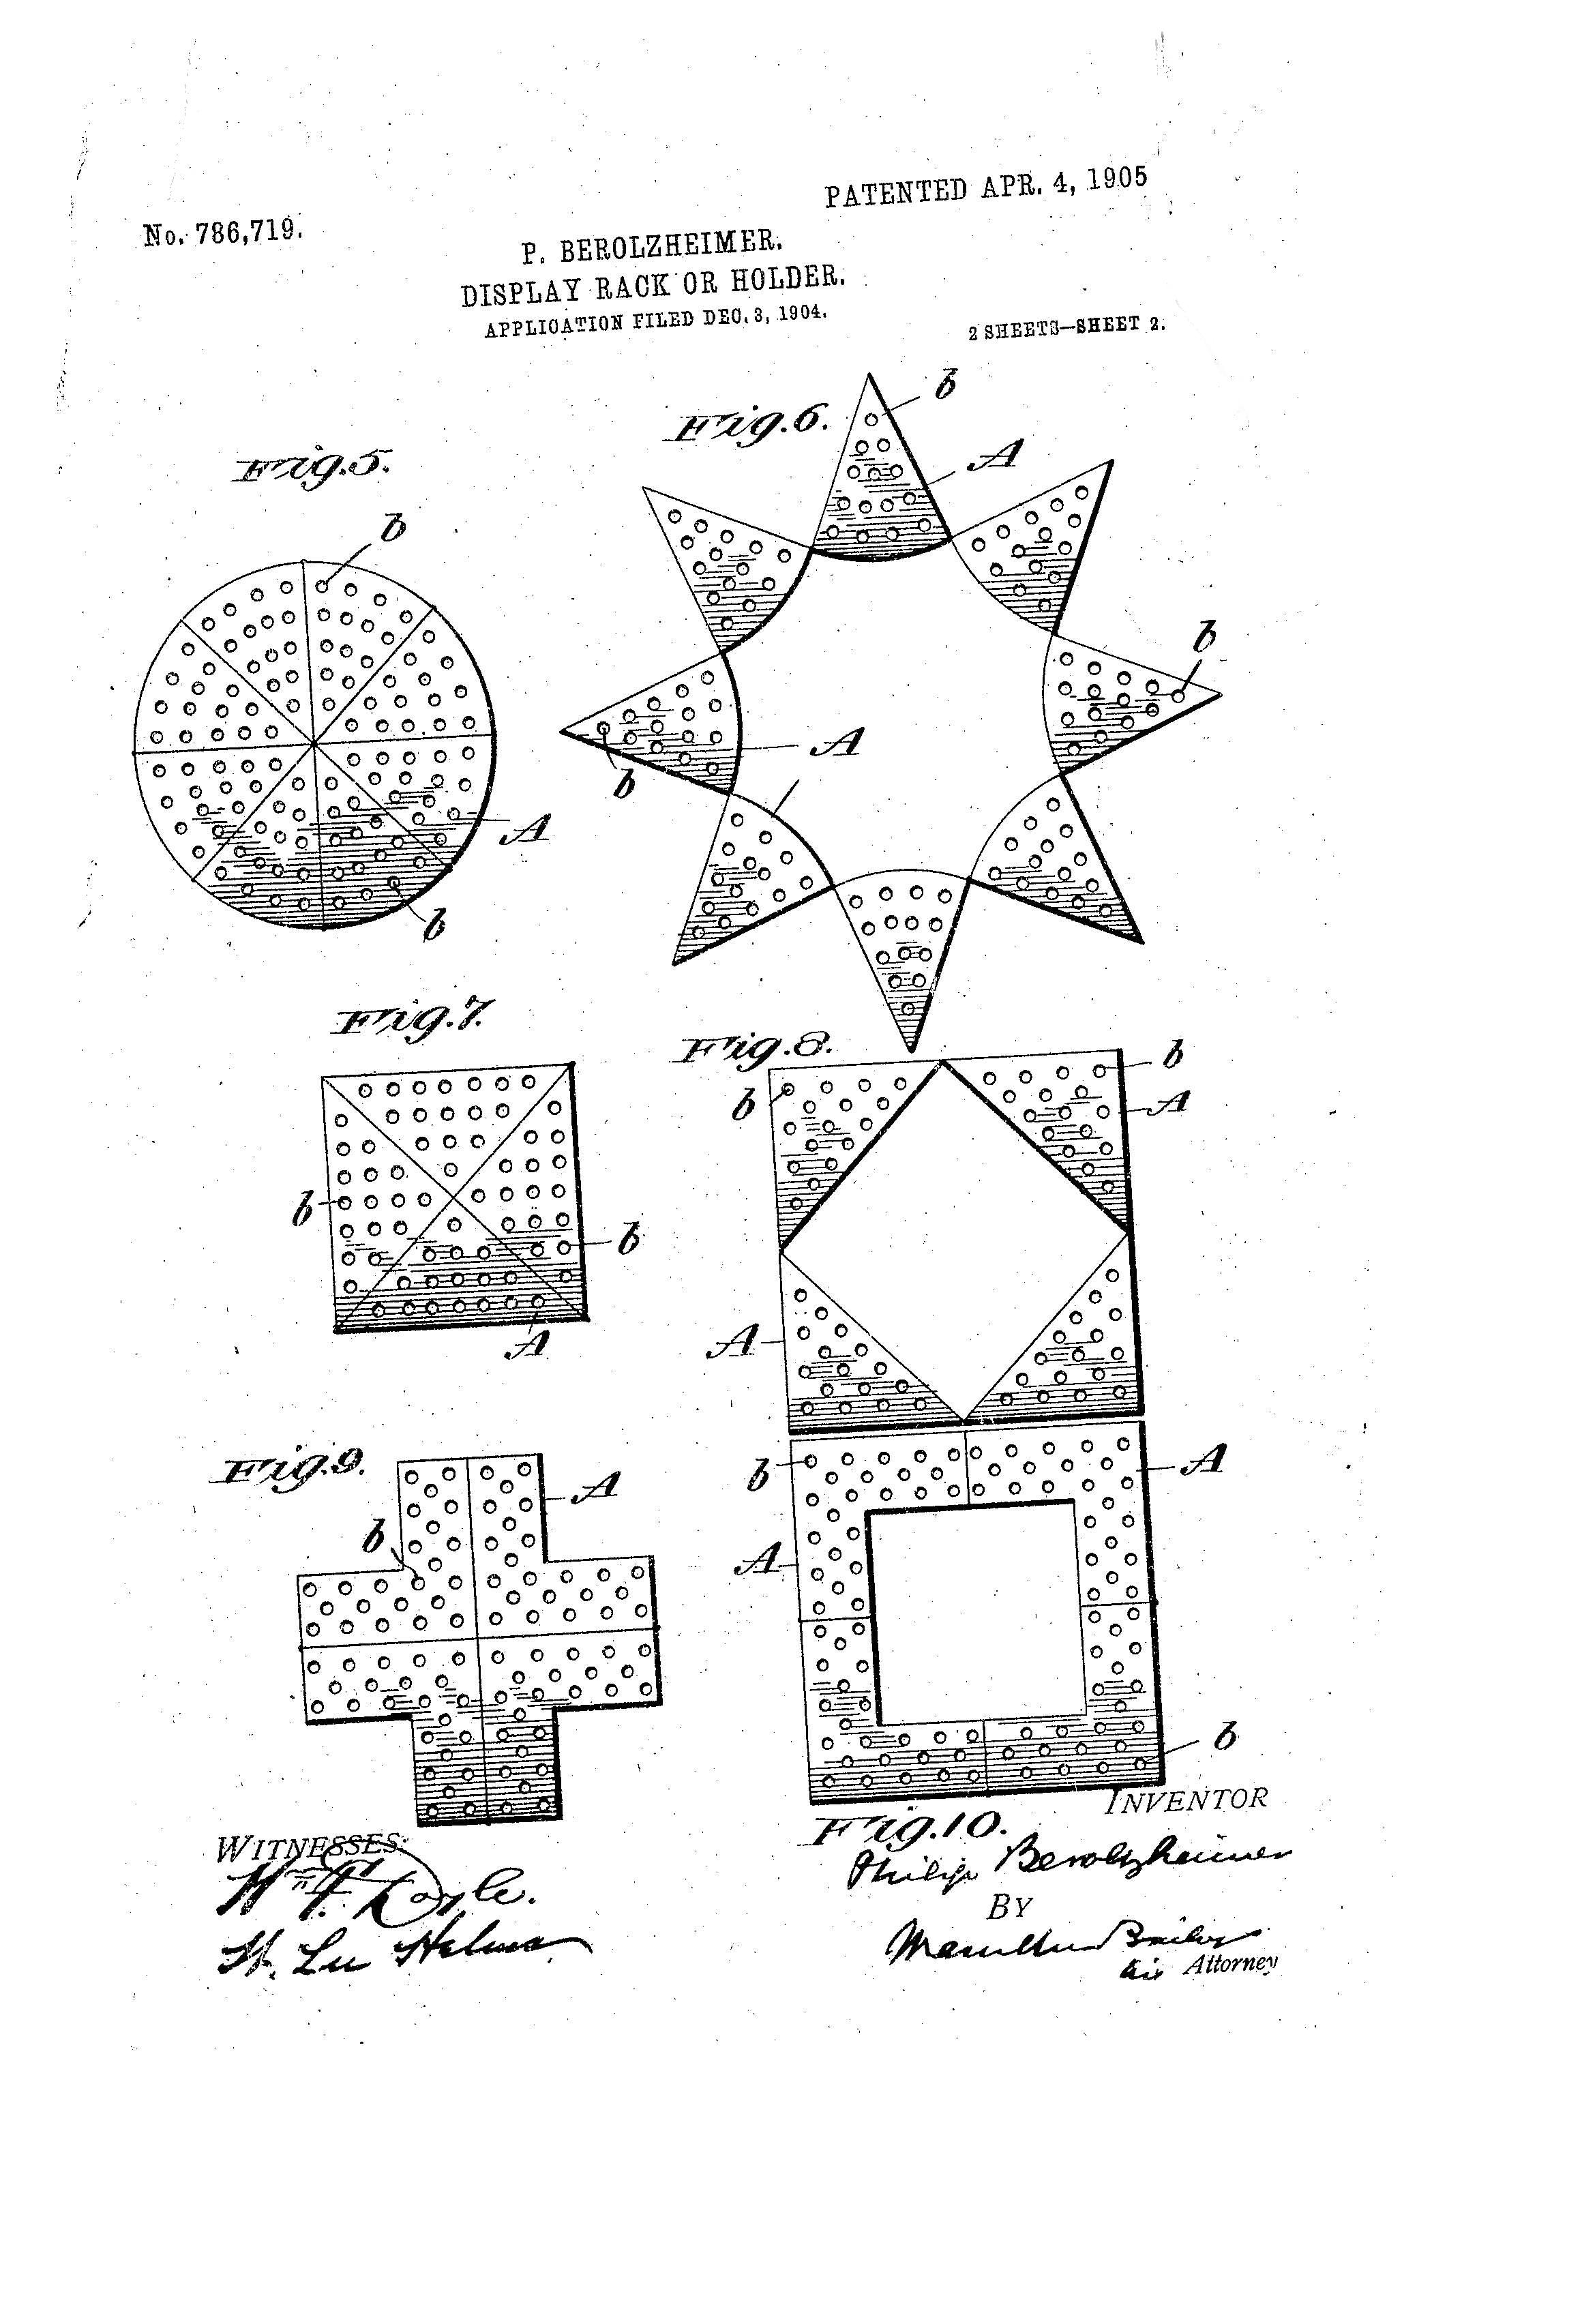 4 - PB 1905 Pencil Display Patent_Page_2.jpg